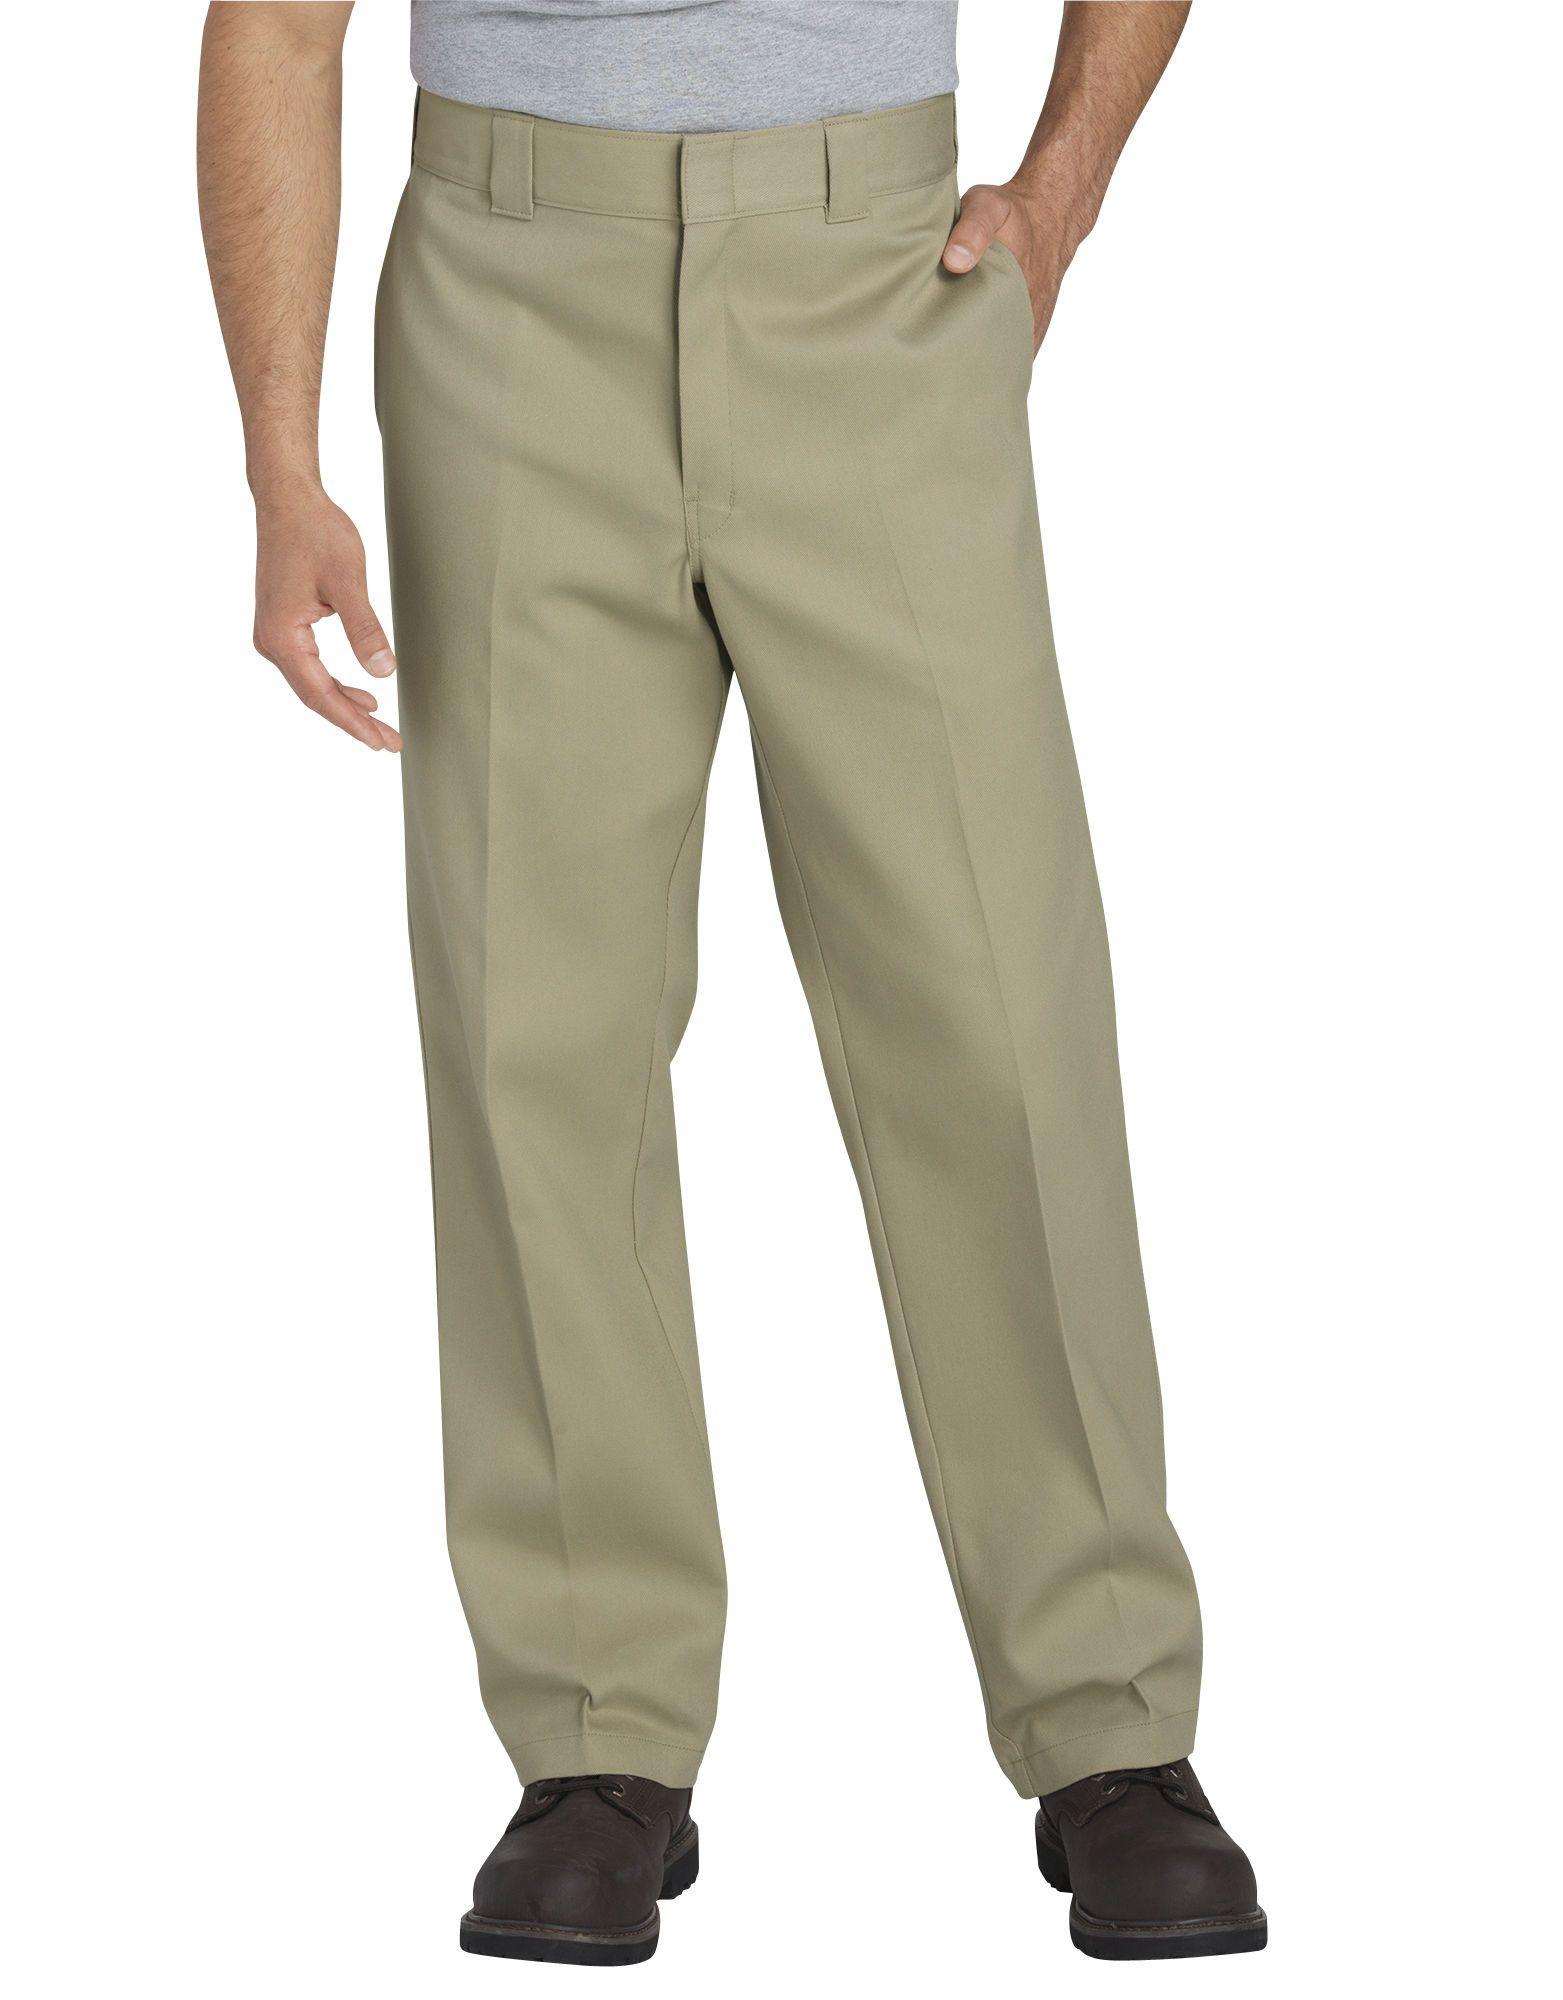 874® FLEX Work Pants, Desert Khaki in 2020 | Pants, Pants design